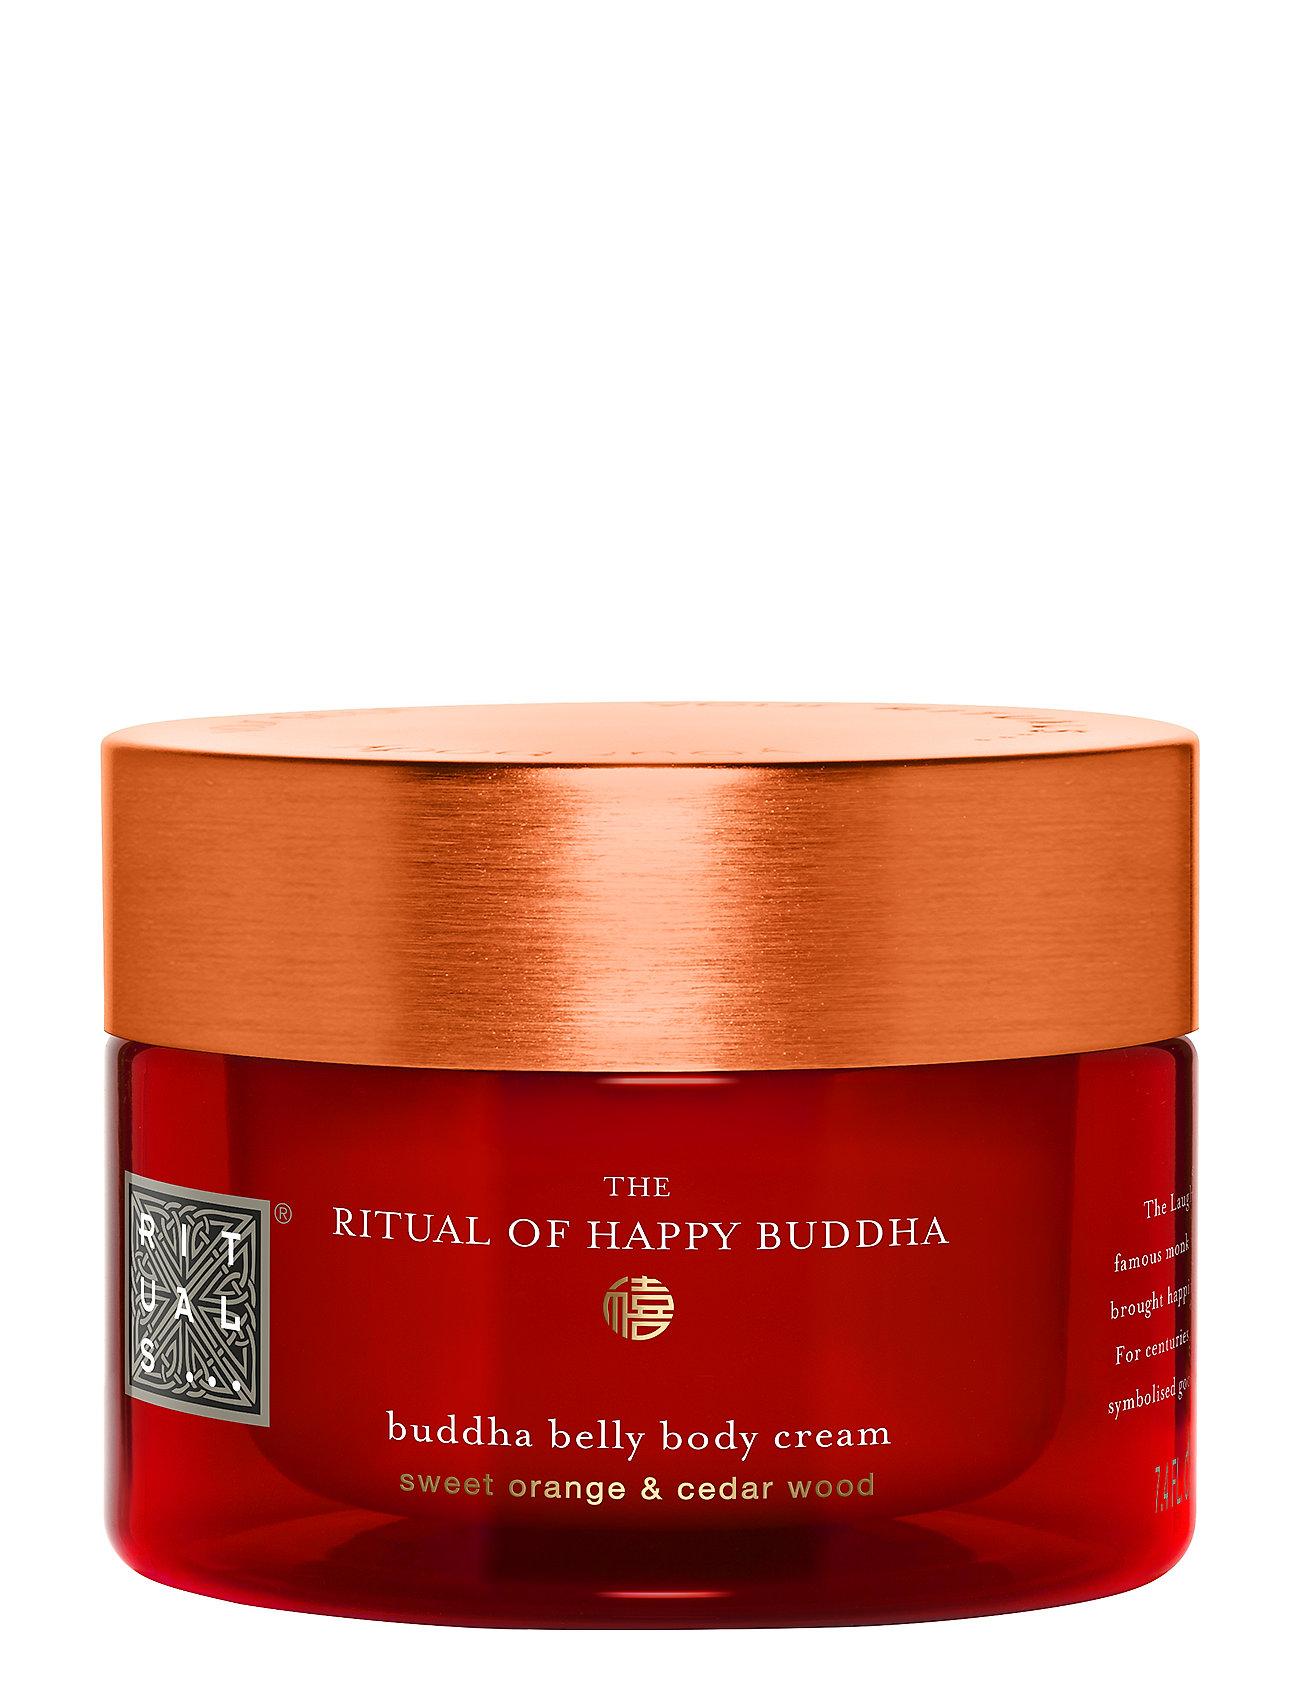 Image of The Ritual Of Happy Buddha Body Cream Body Lotion Hudcreme Nude Rituals (3406192573)